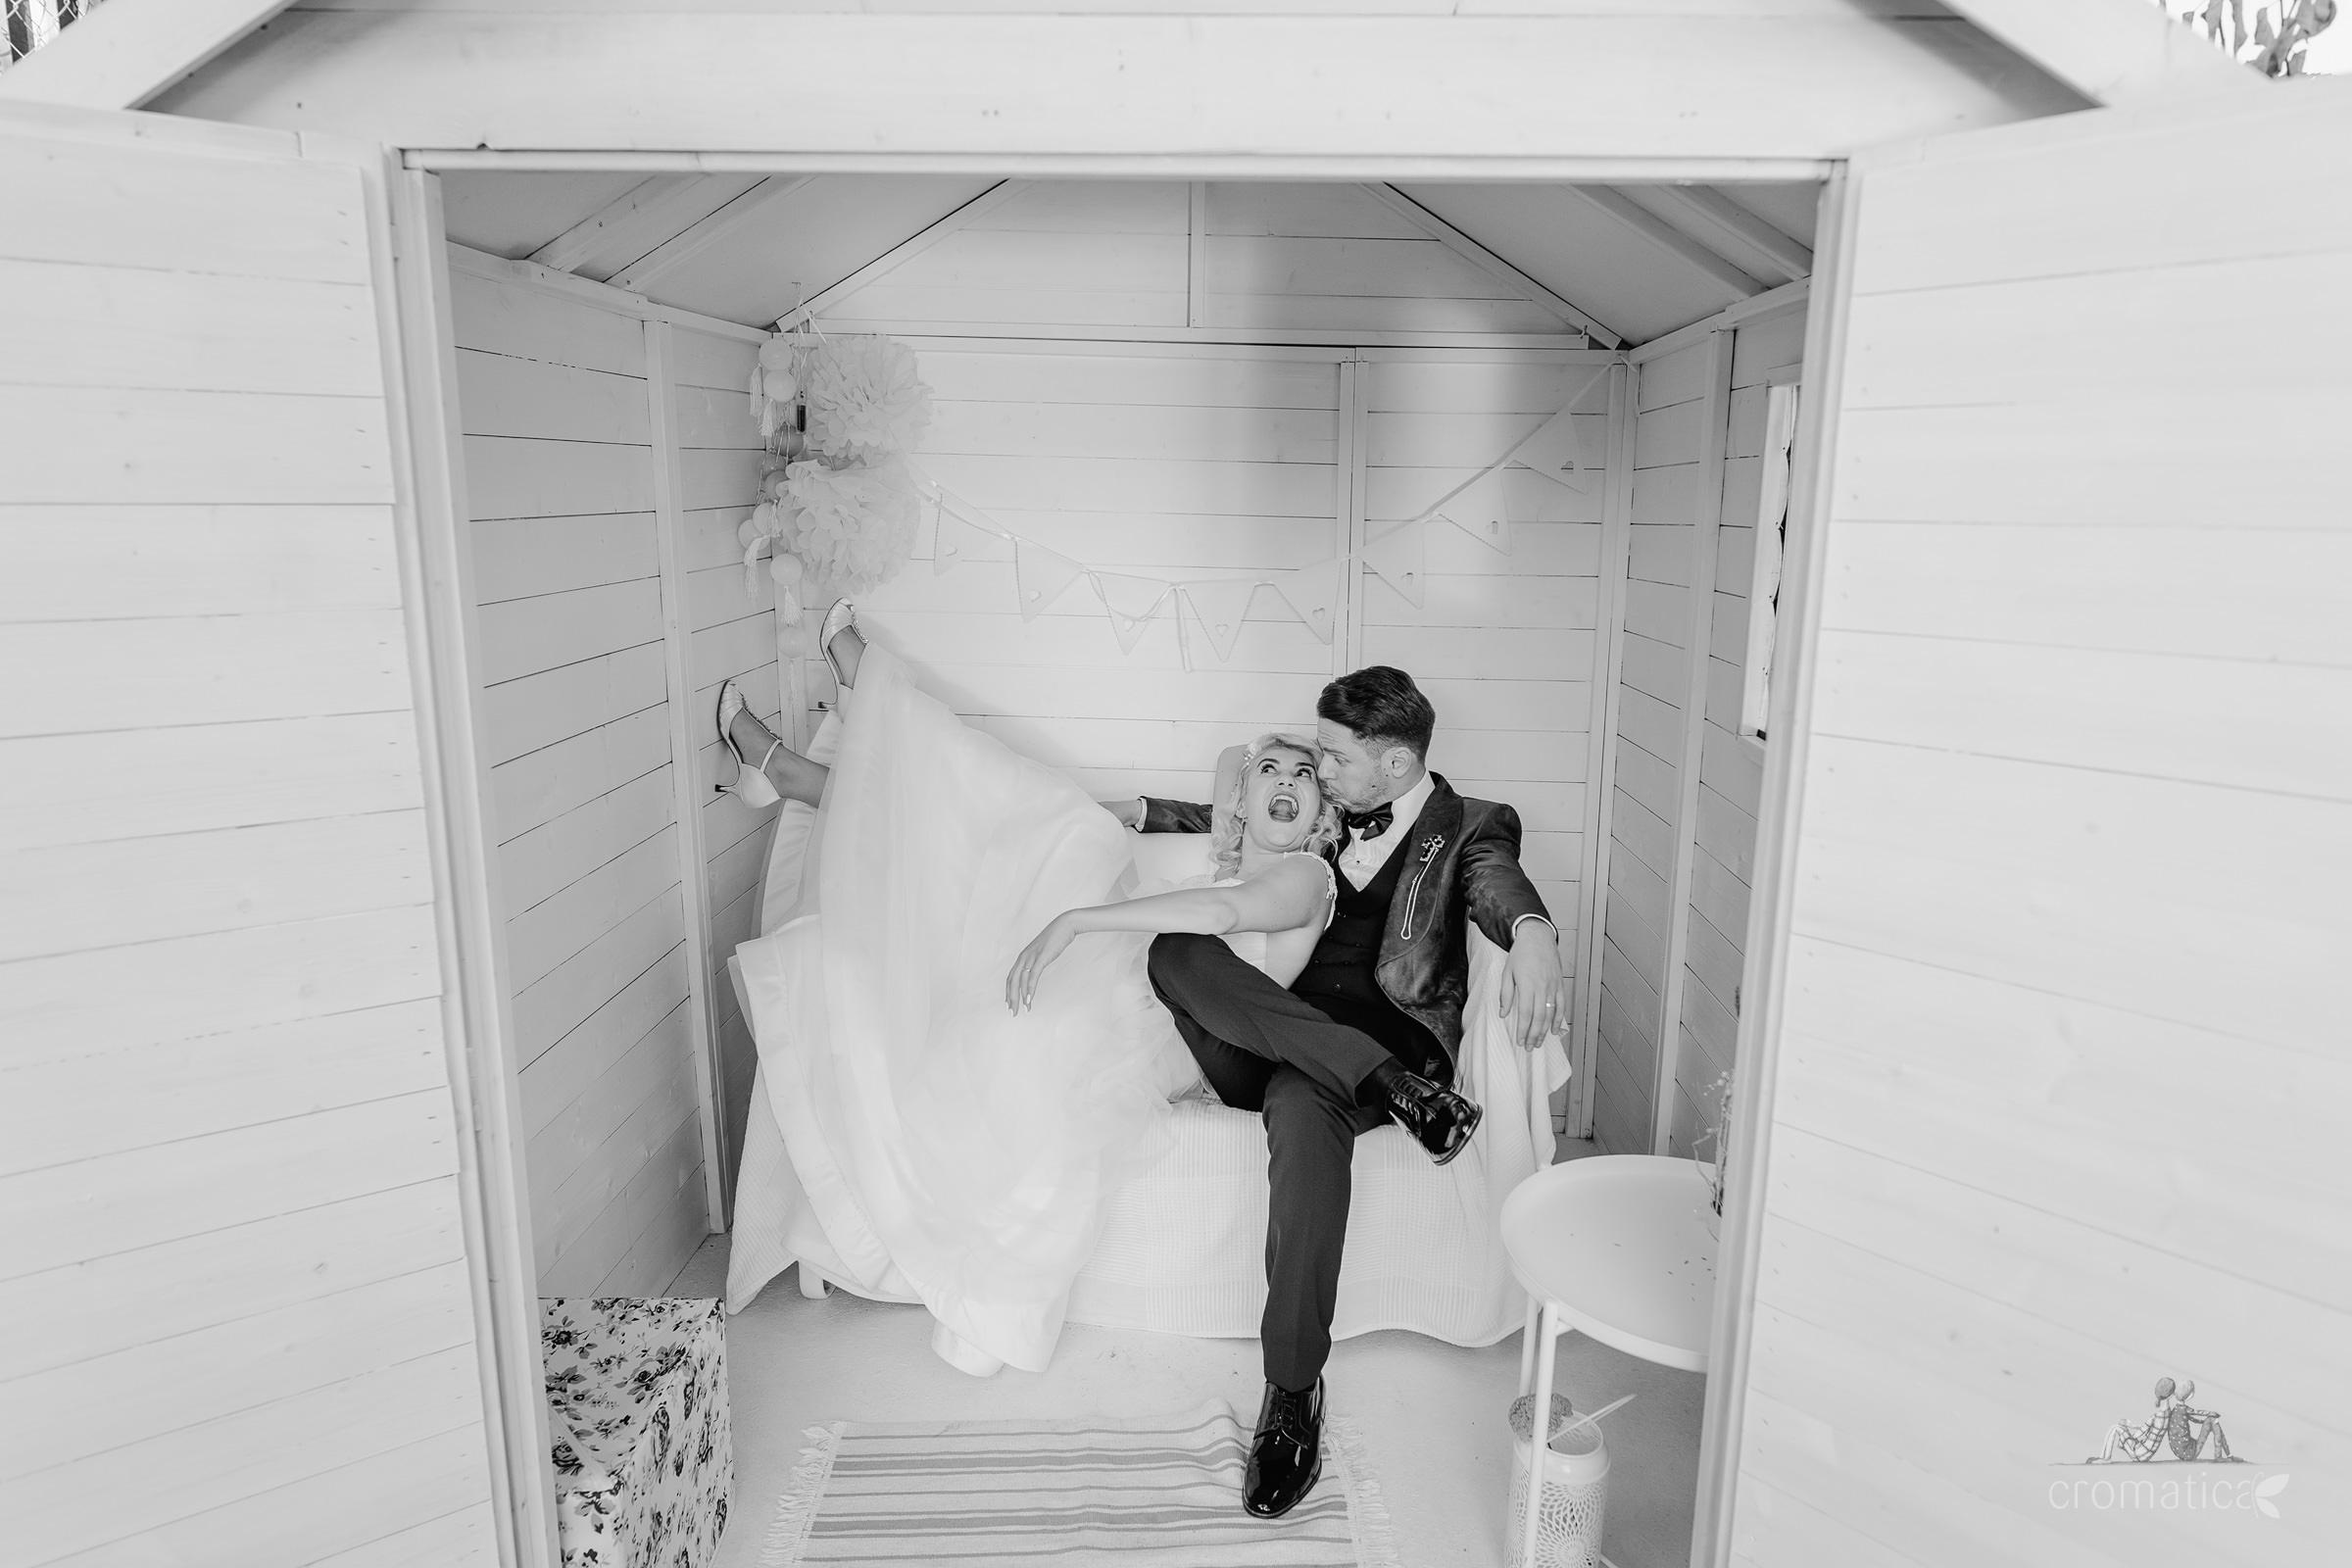 ana mihai fotografii nunta gradina lahovari 065